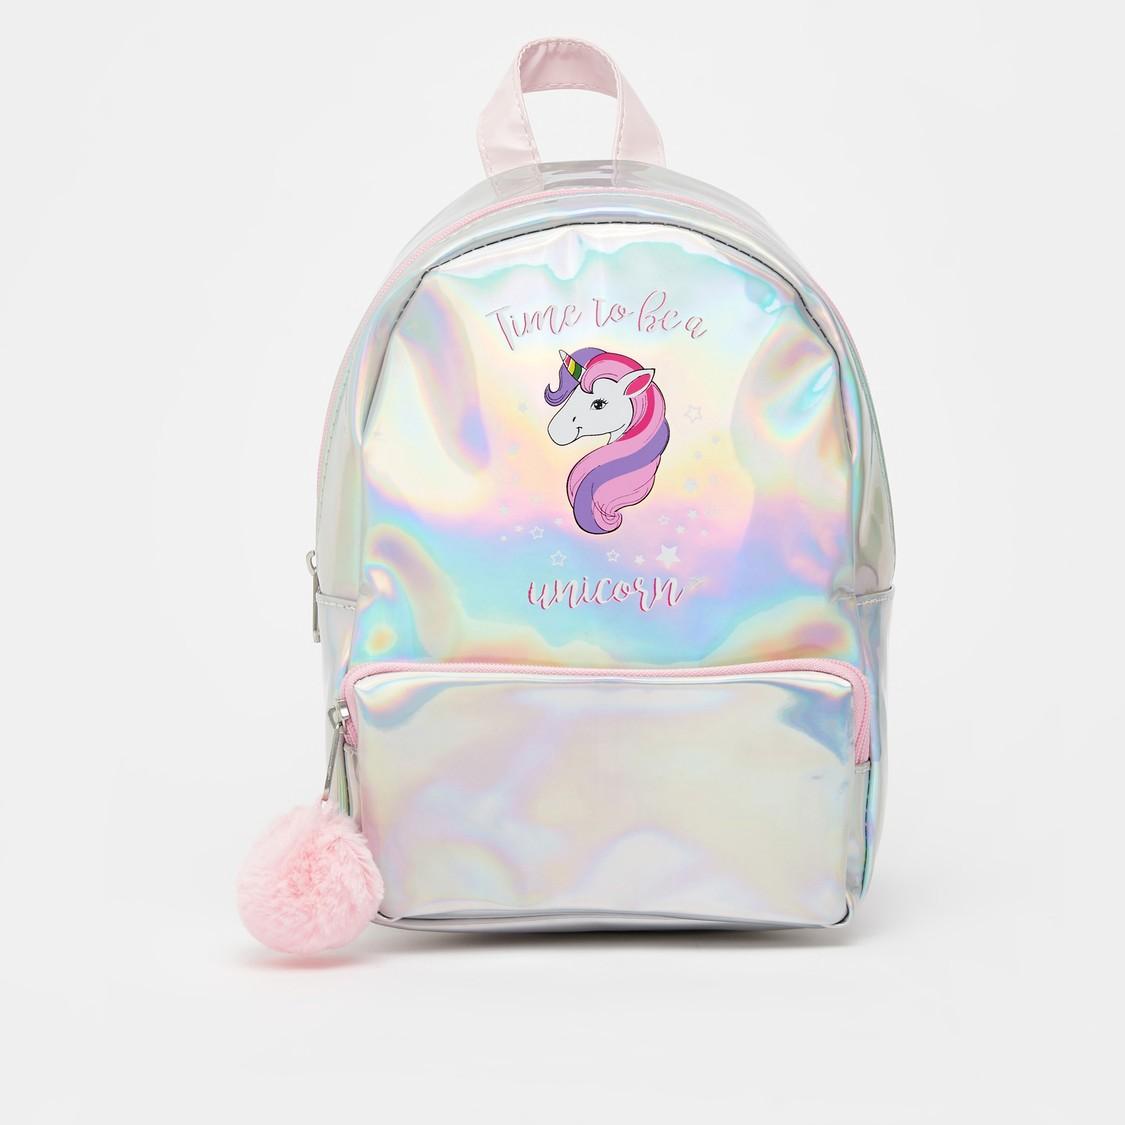 Unicorn Print Backpack with Pom Pom Applique Detail